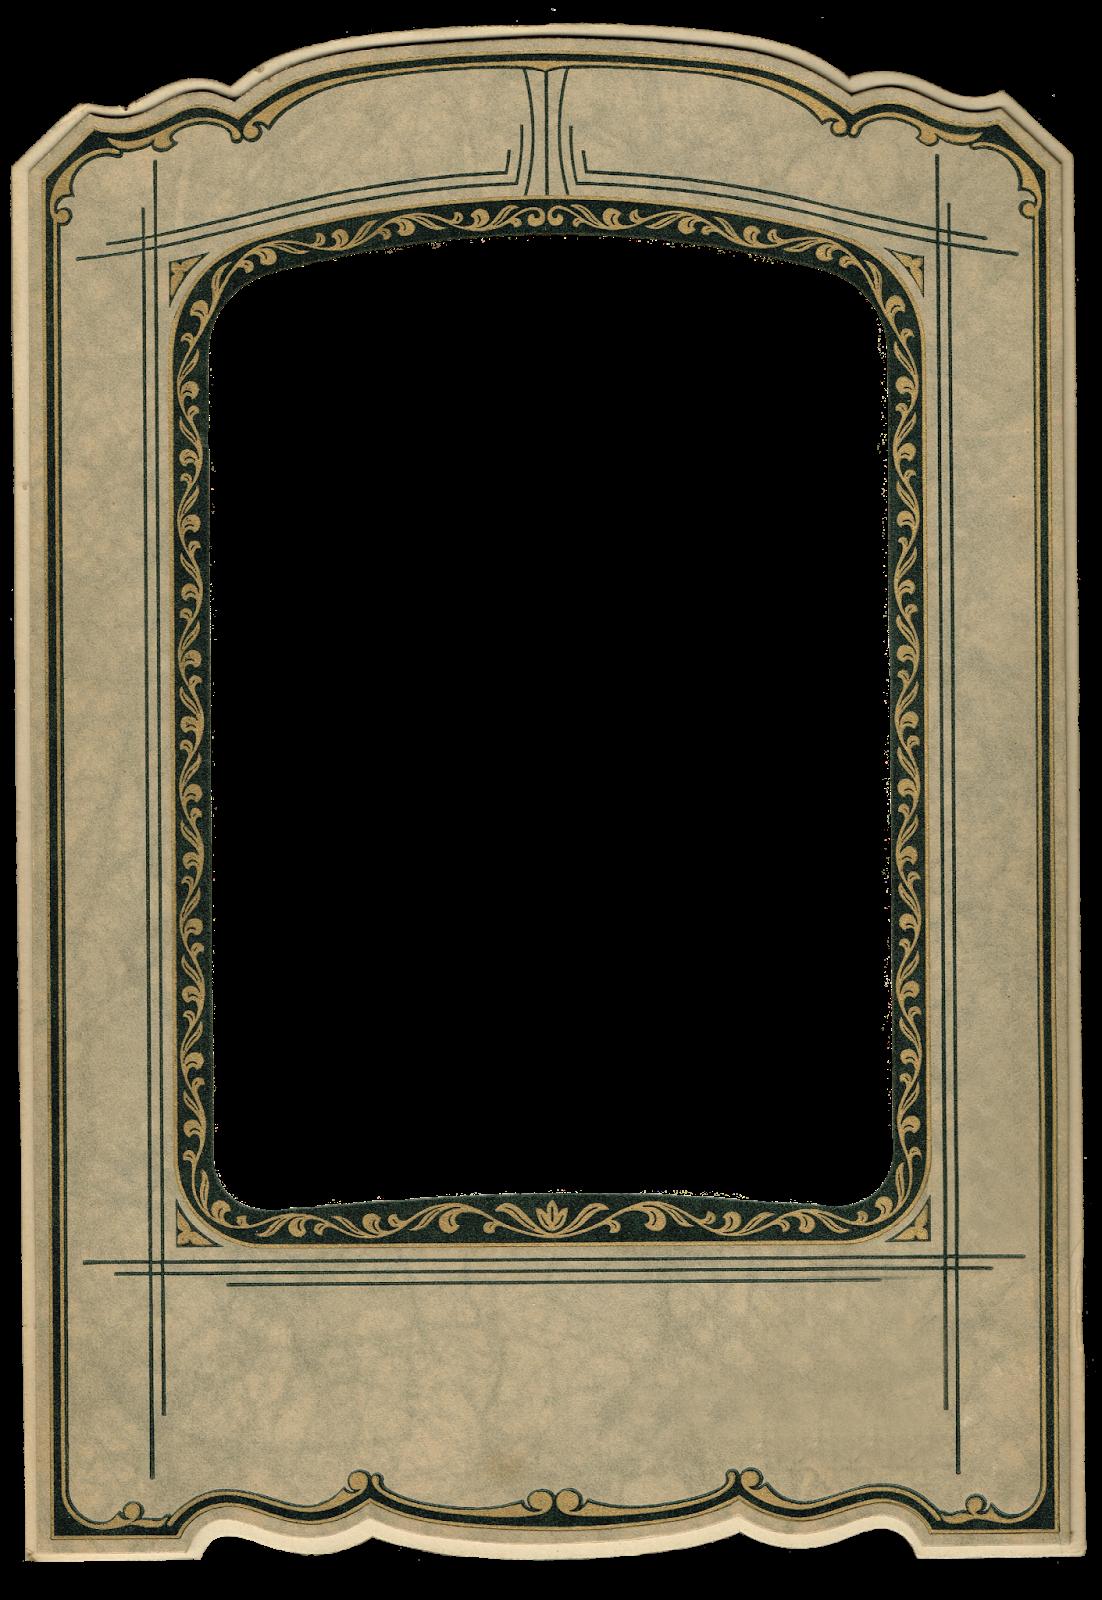 Antique Photo Frame - Antique Graphics Wednesday | Knick ...